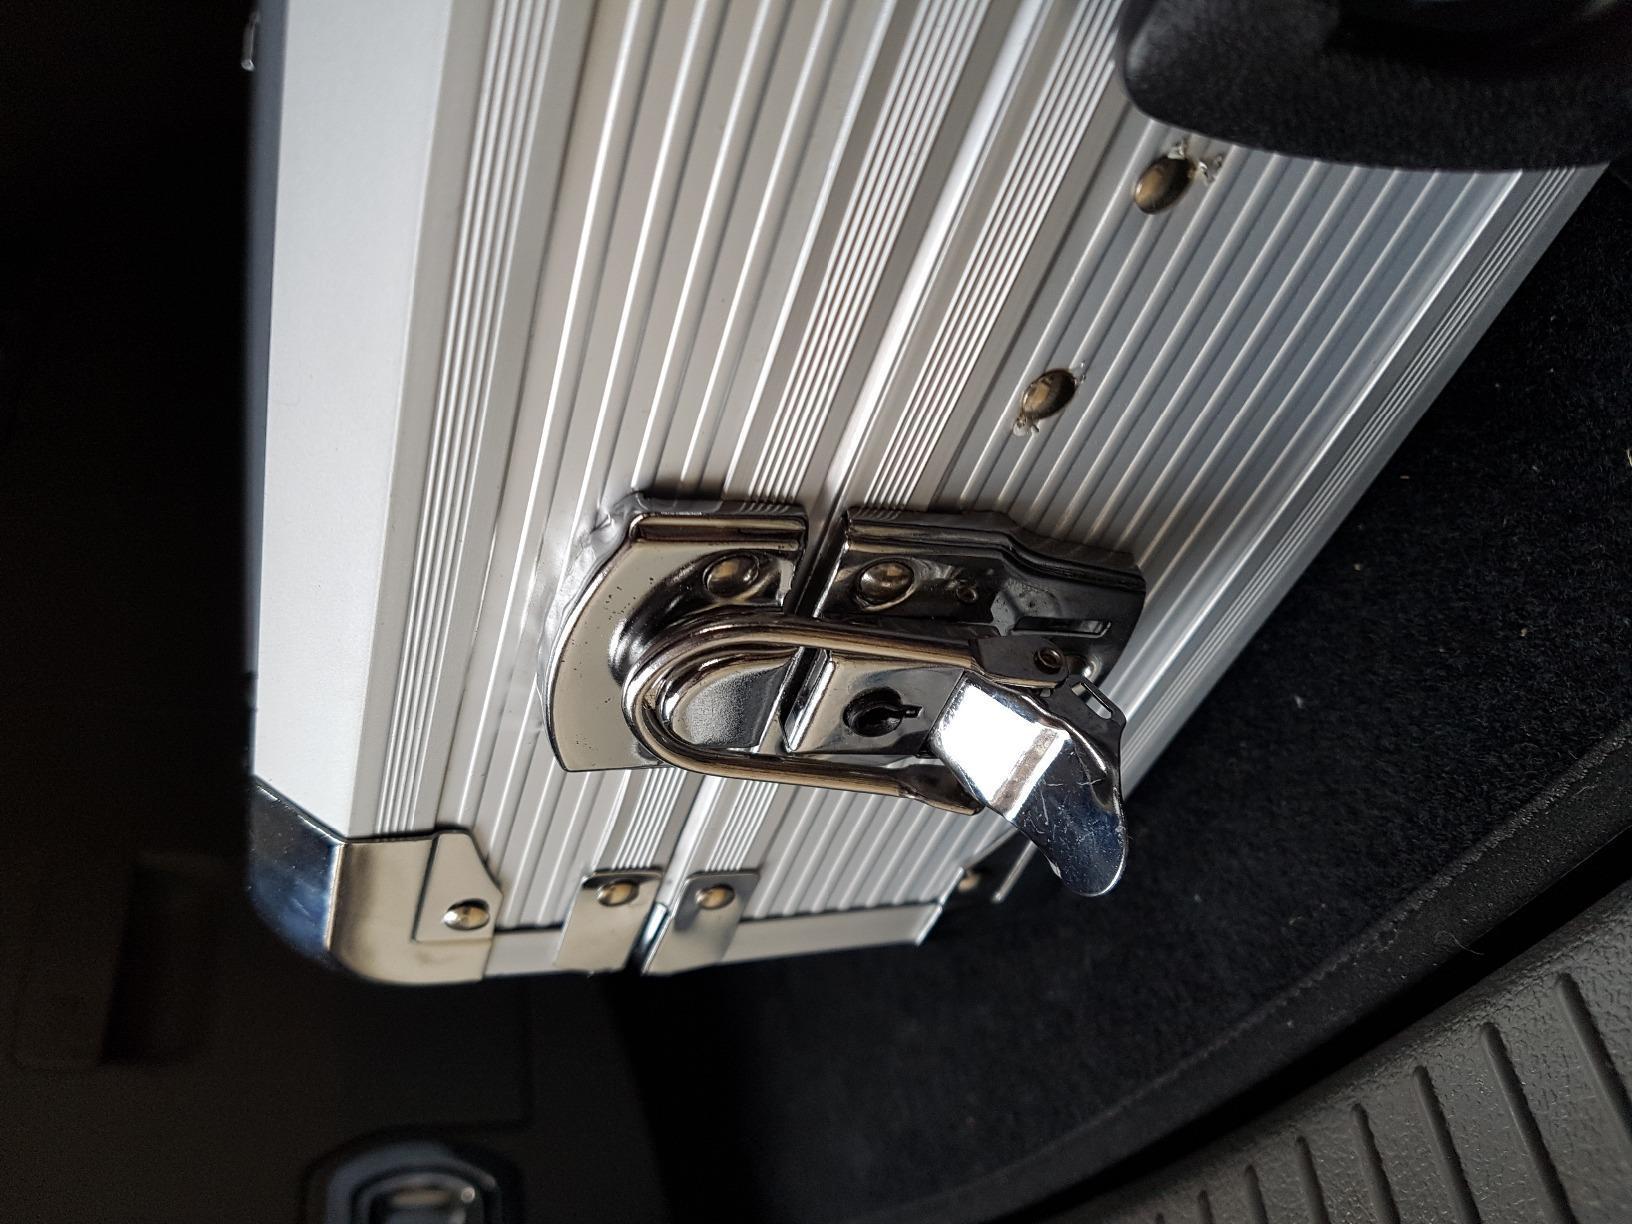 108-tlg Alu-Werkzeugkoffer bestückt photo review